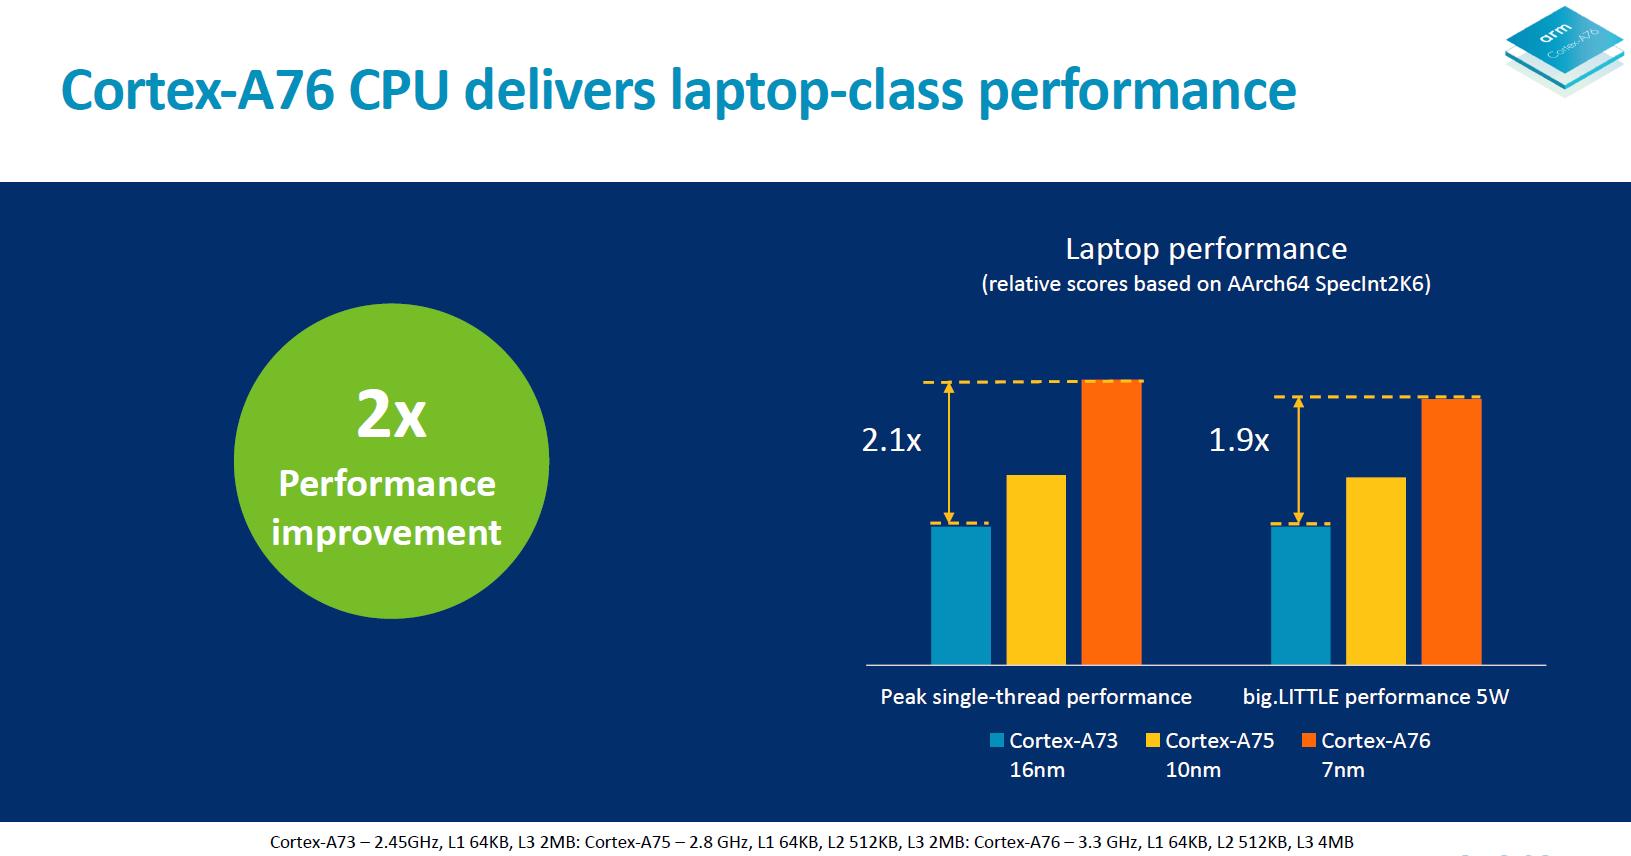 Arm Unveils Client CPU Performance Roadmap Through 2020